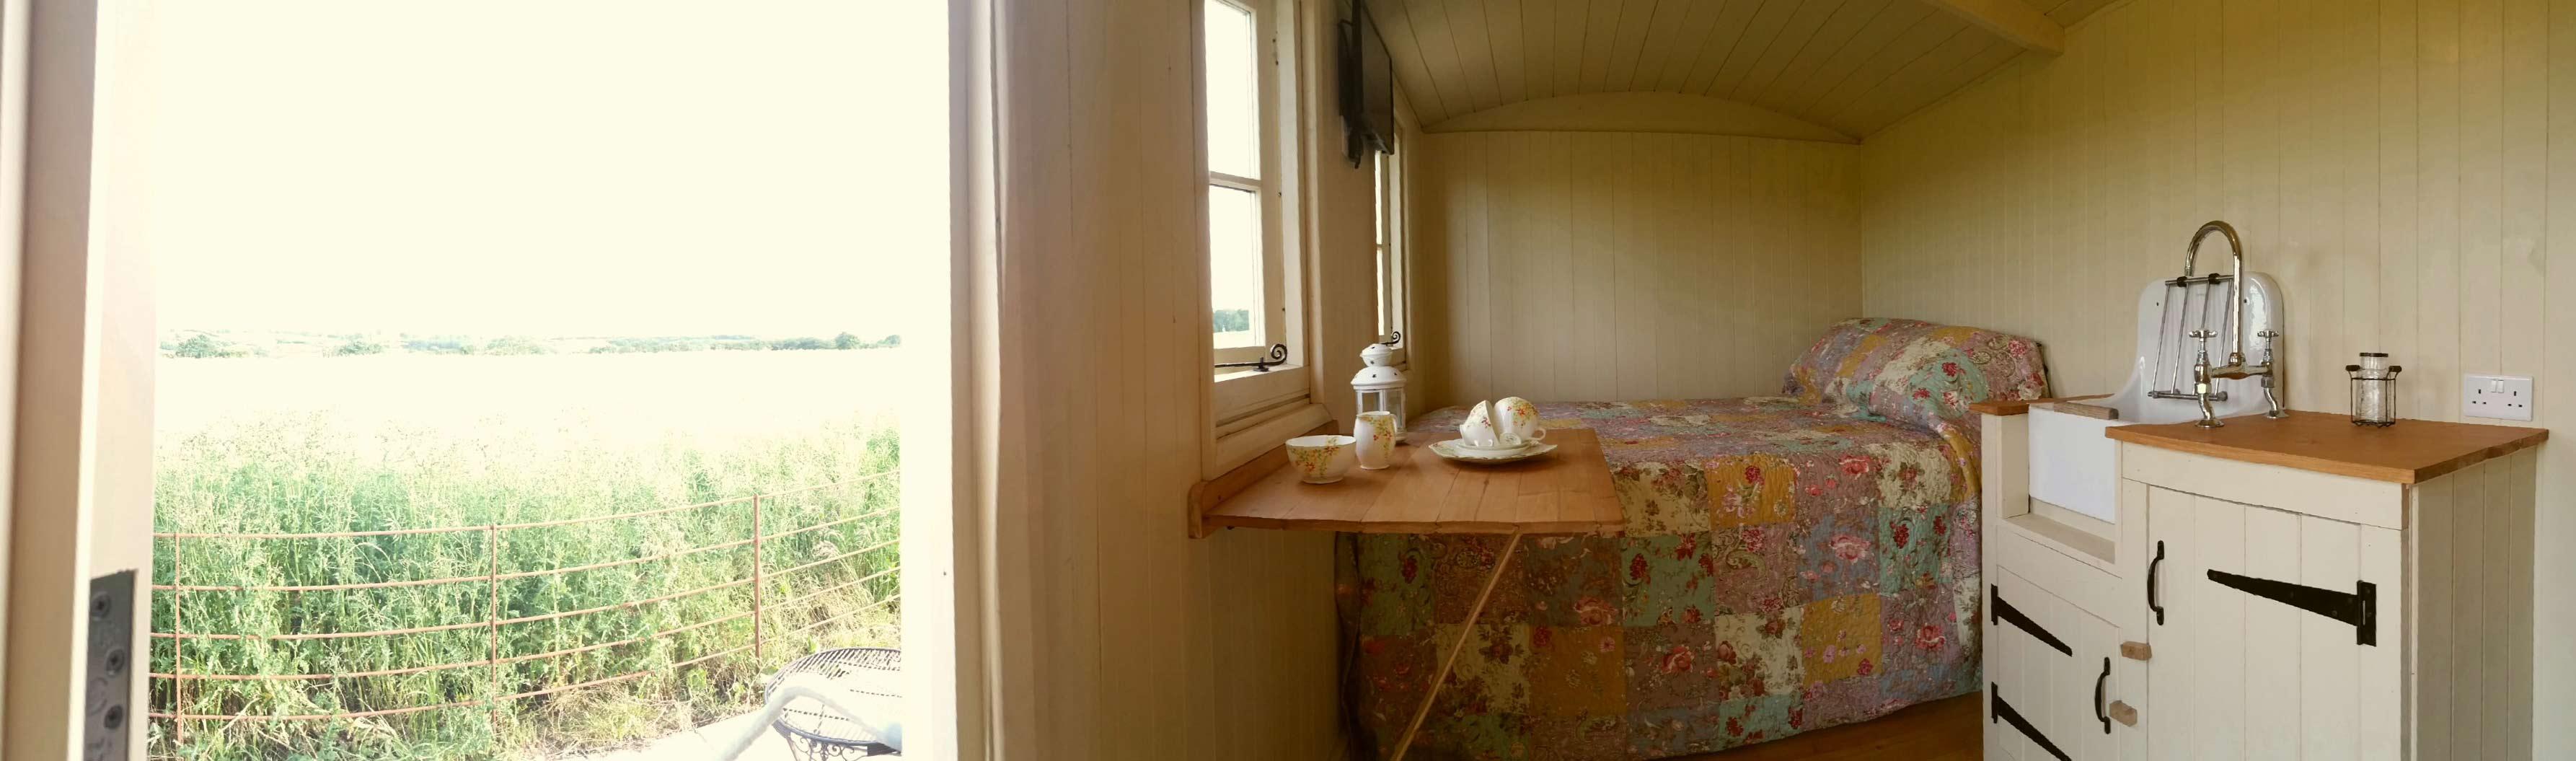 Inside-Shepherds-Hut-Panoram-Bath-Garden-View